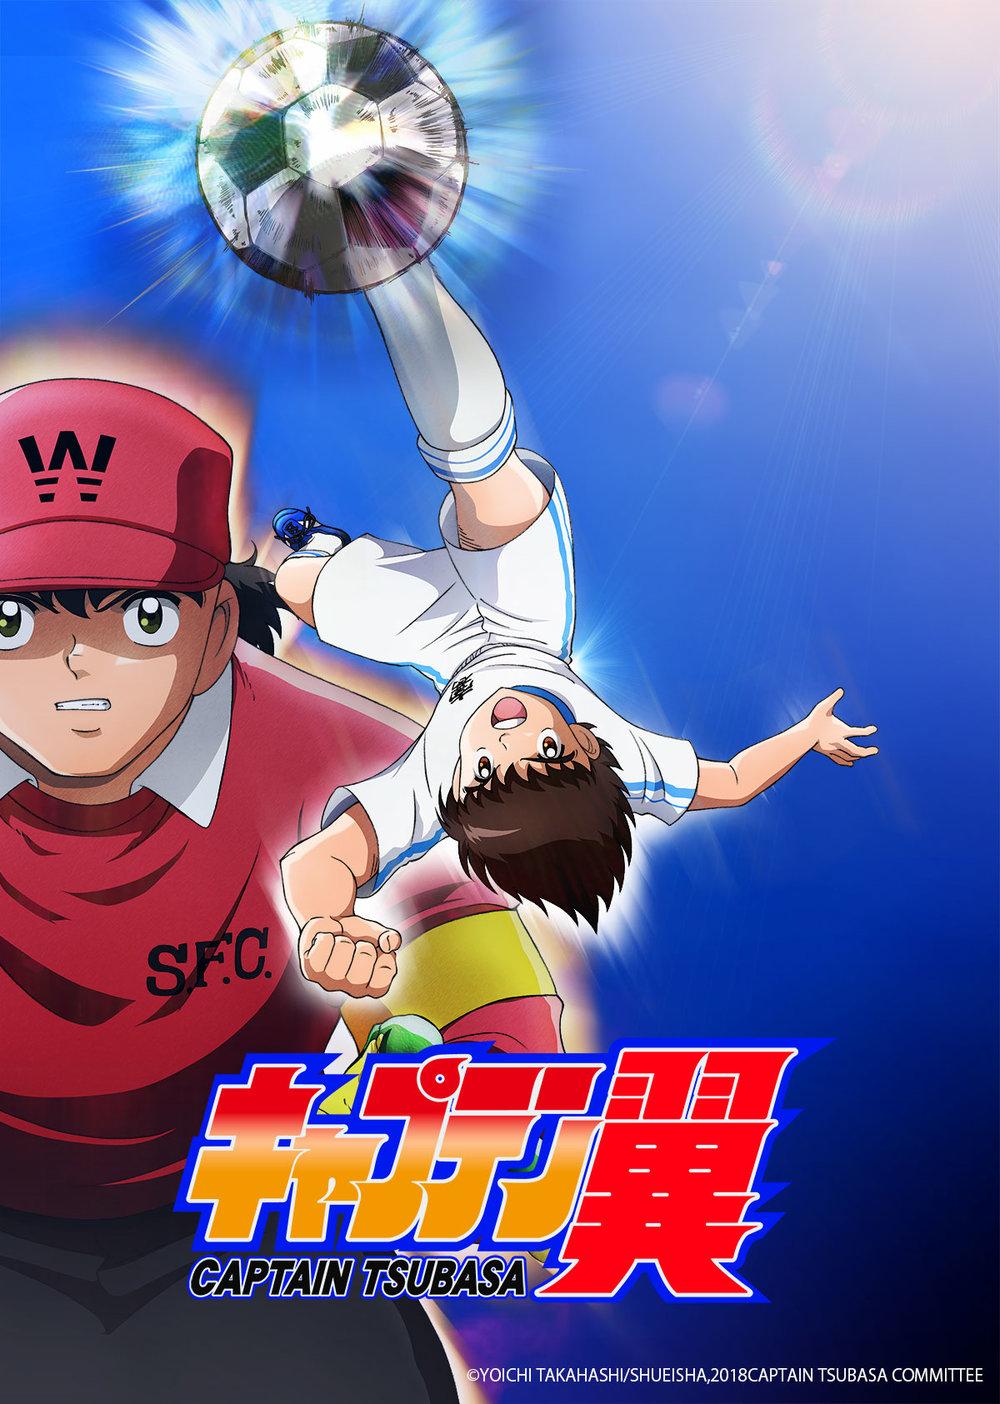 CaptainTsubasa-KeyVisual.jpg